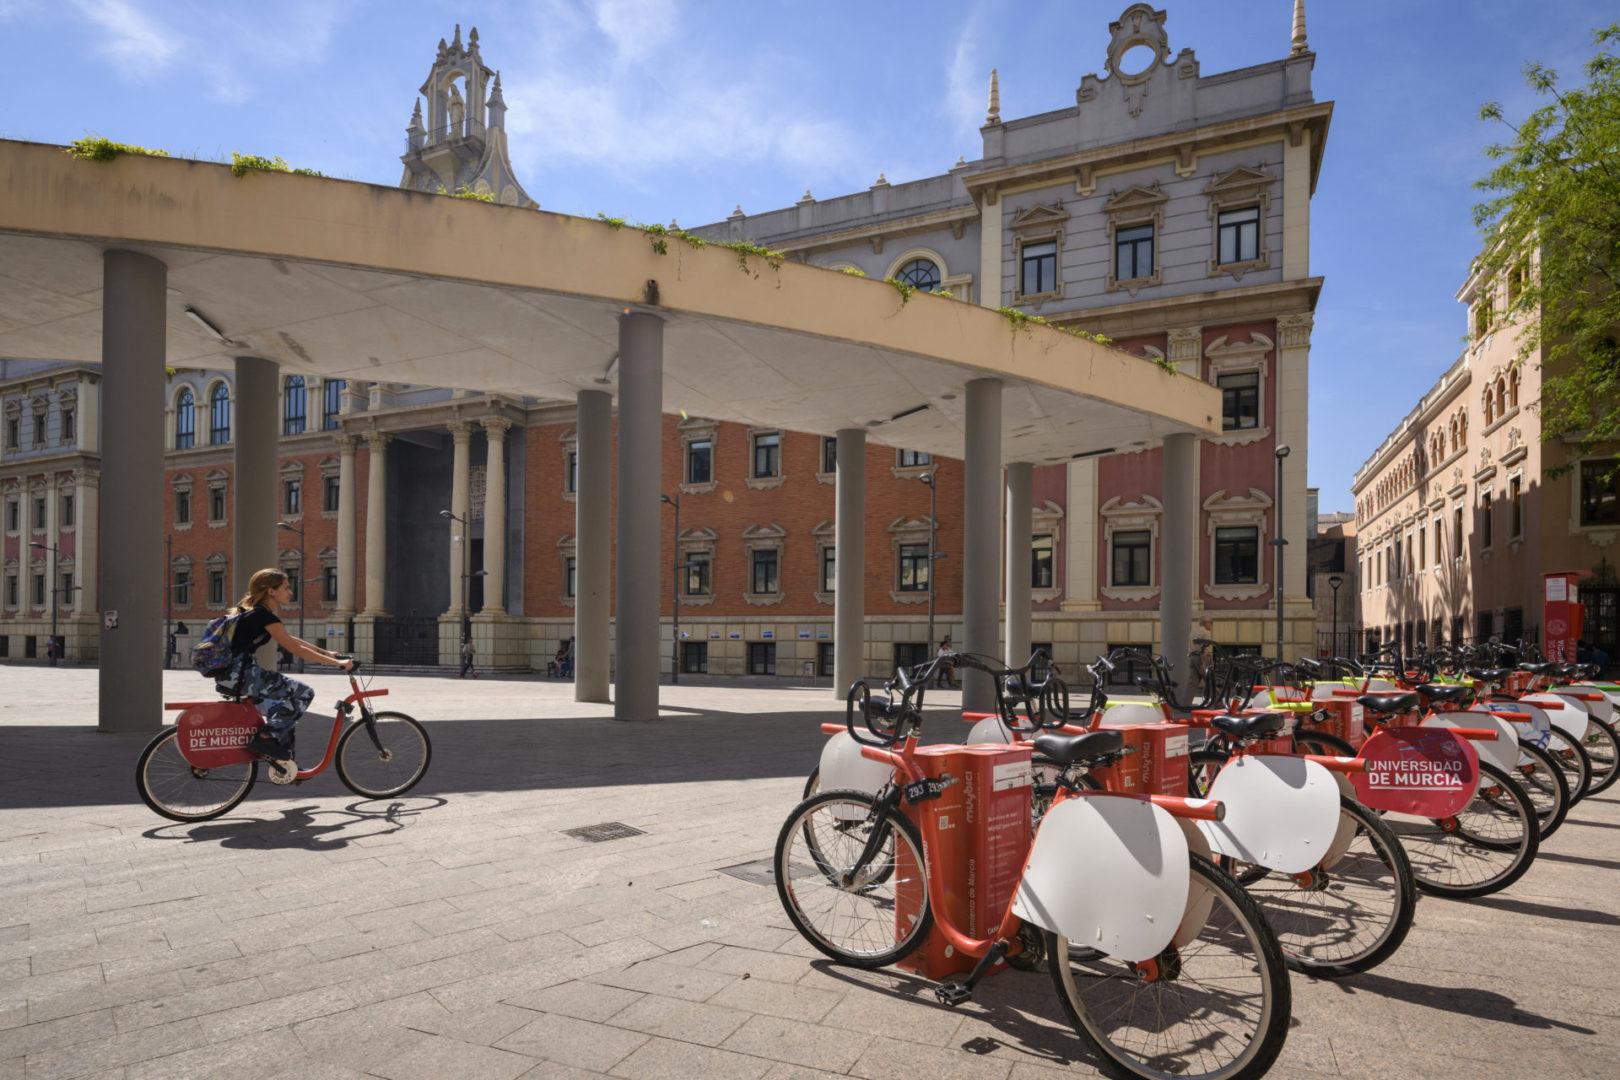 Carril Bici MU 2-138-Urdecon